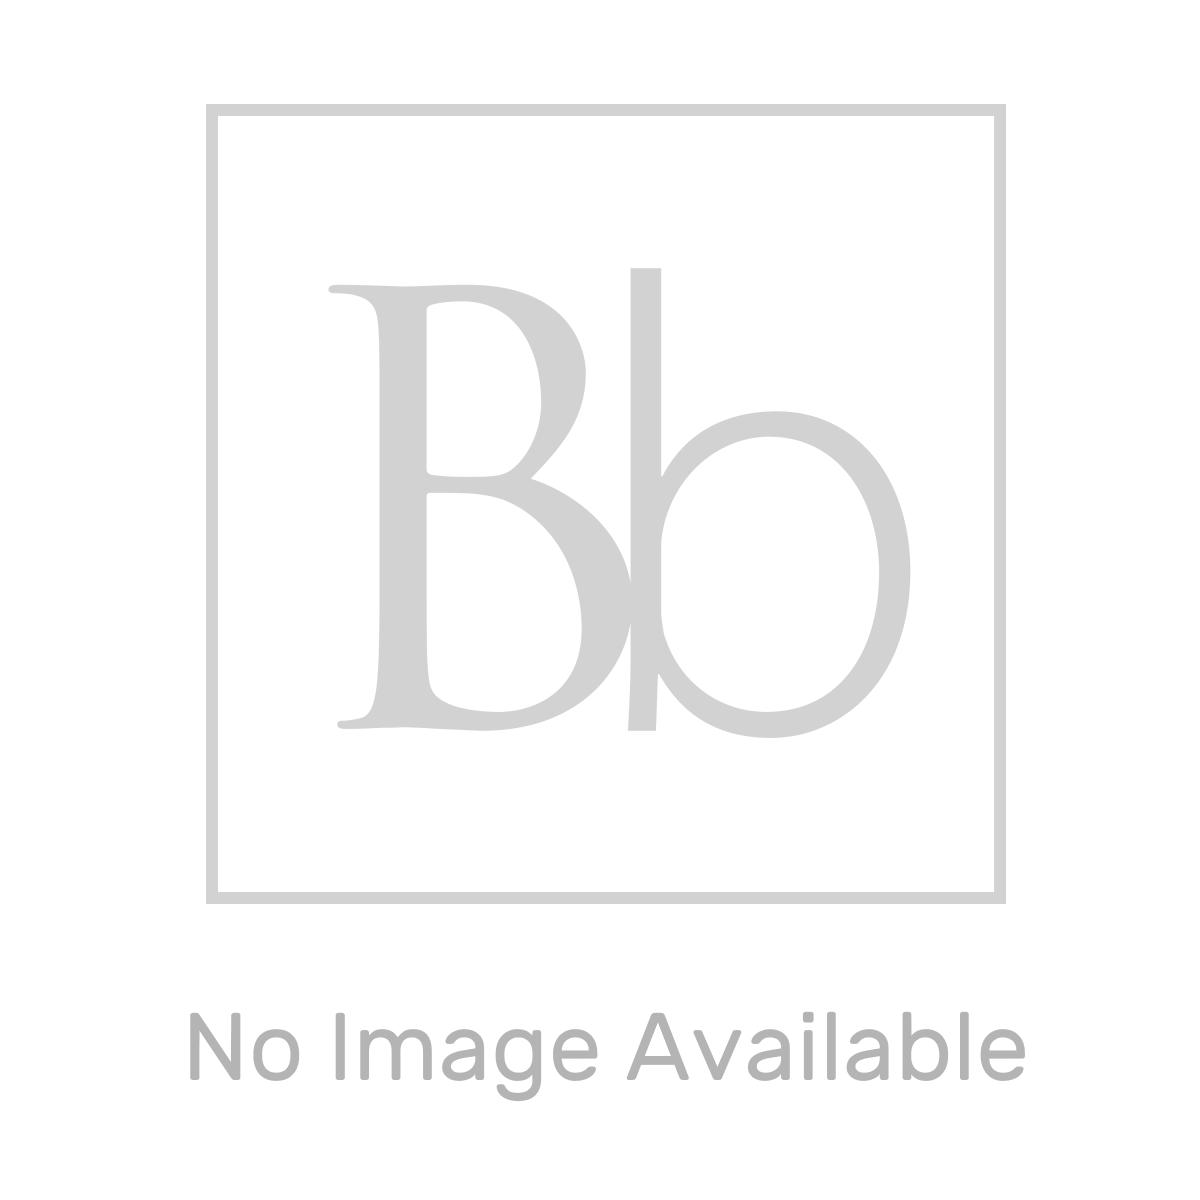 RAK Karla Single Ended Bath 1700mm Measurements